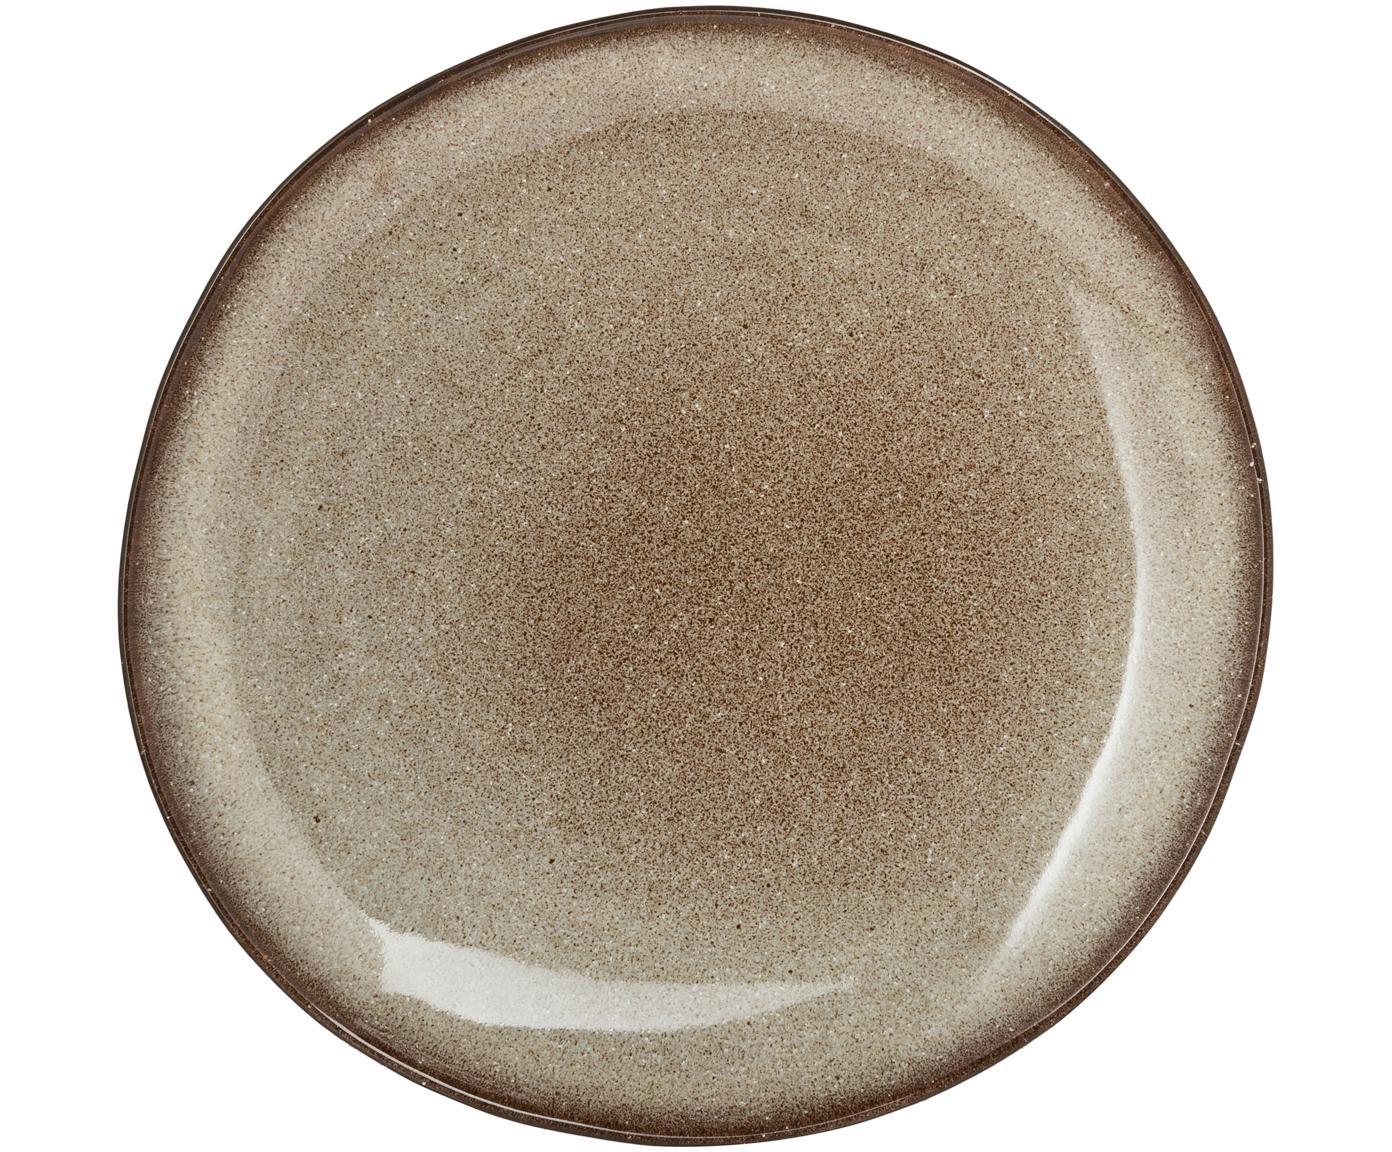 Handgemachter Frühstücksteller Sandrine, Keramik, Hellgrau, Beige, Ø 22 x H 2 cm